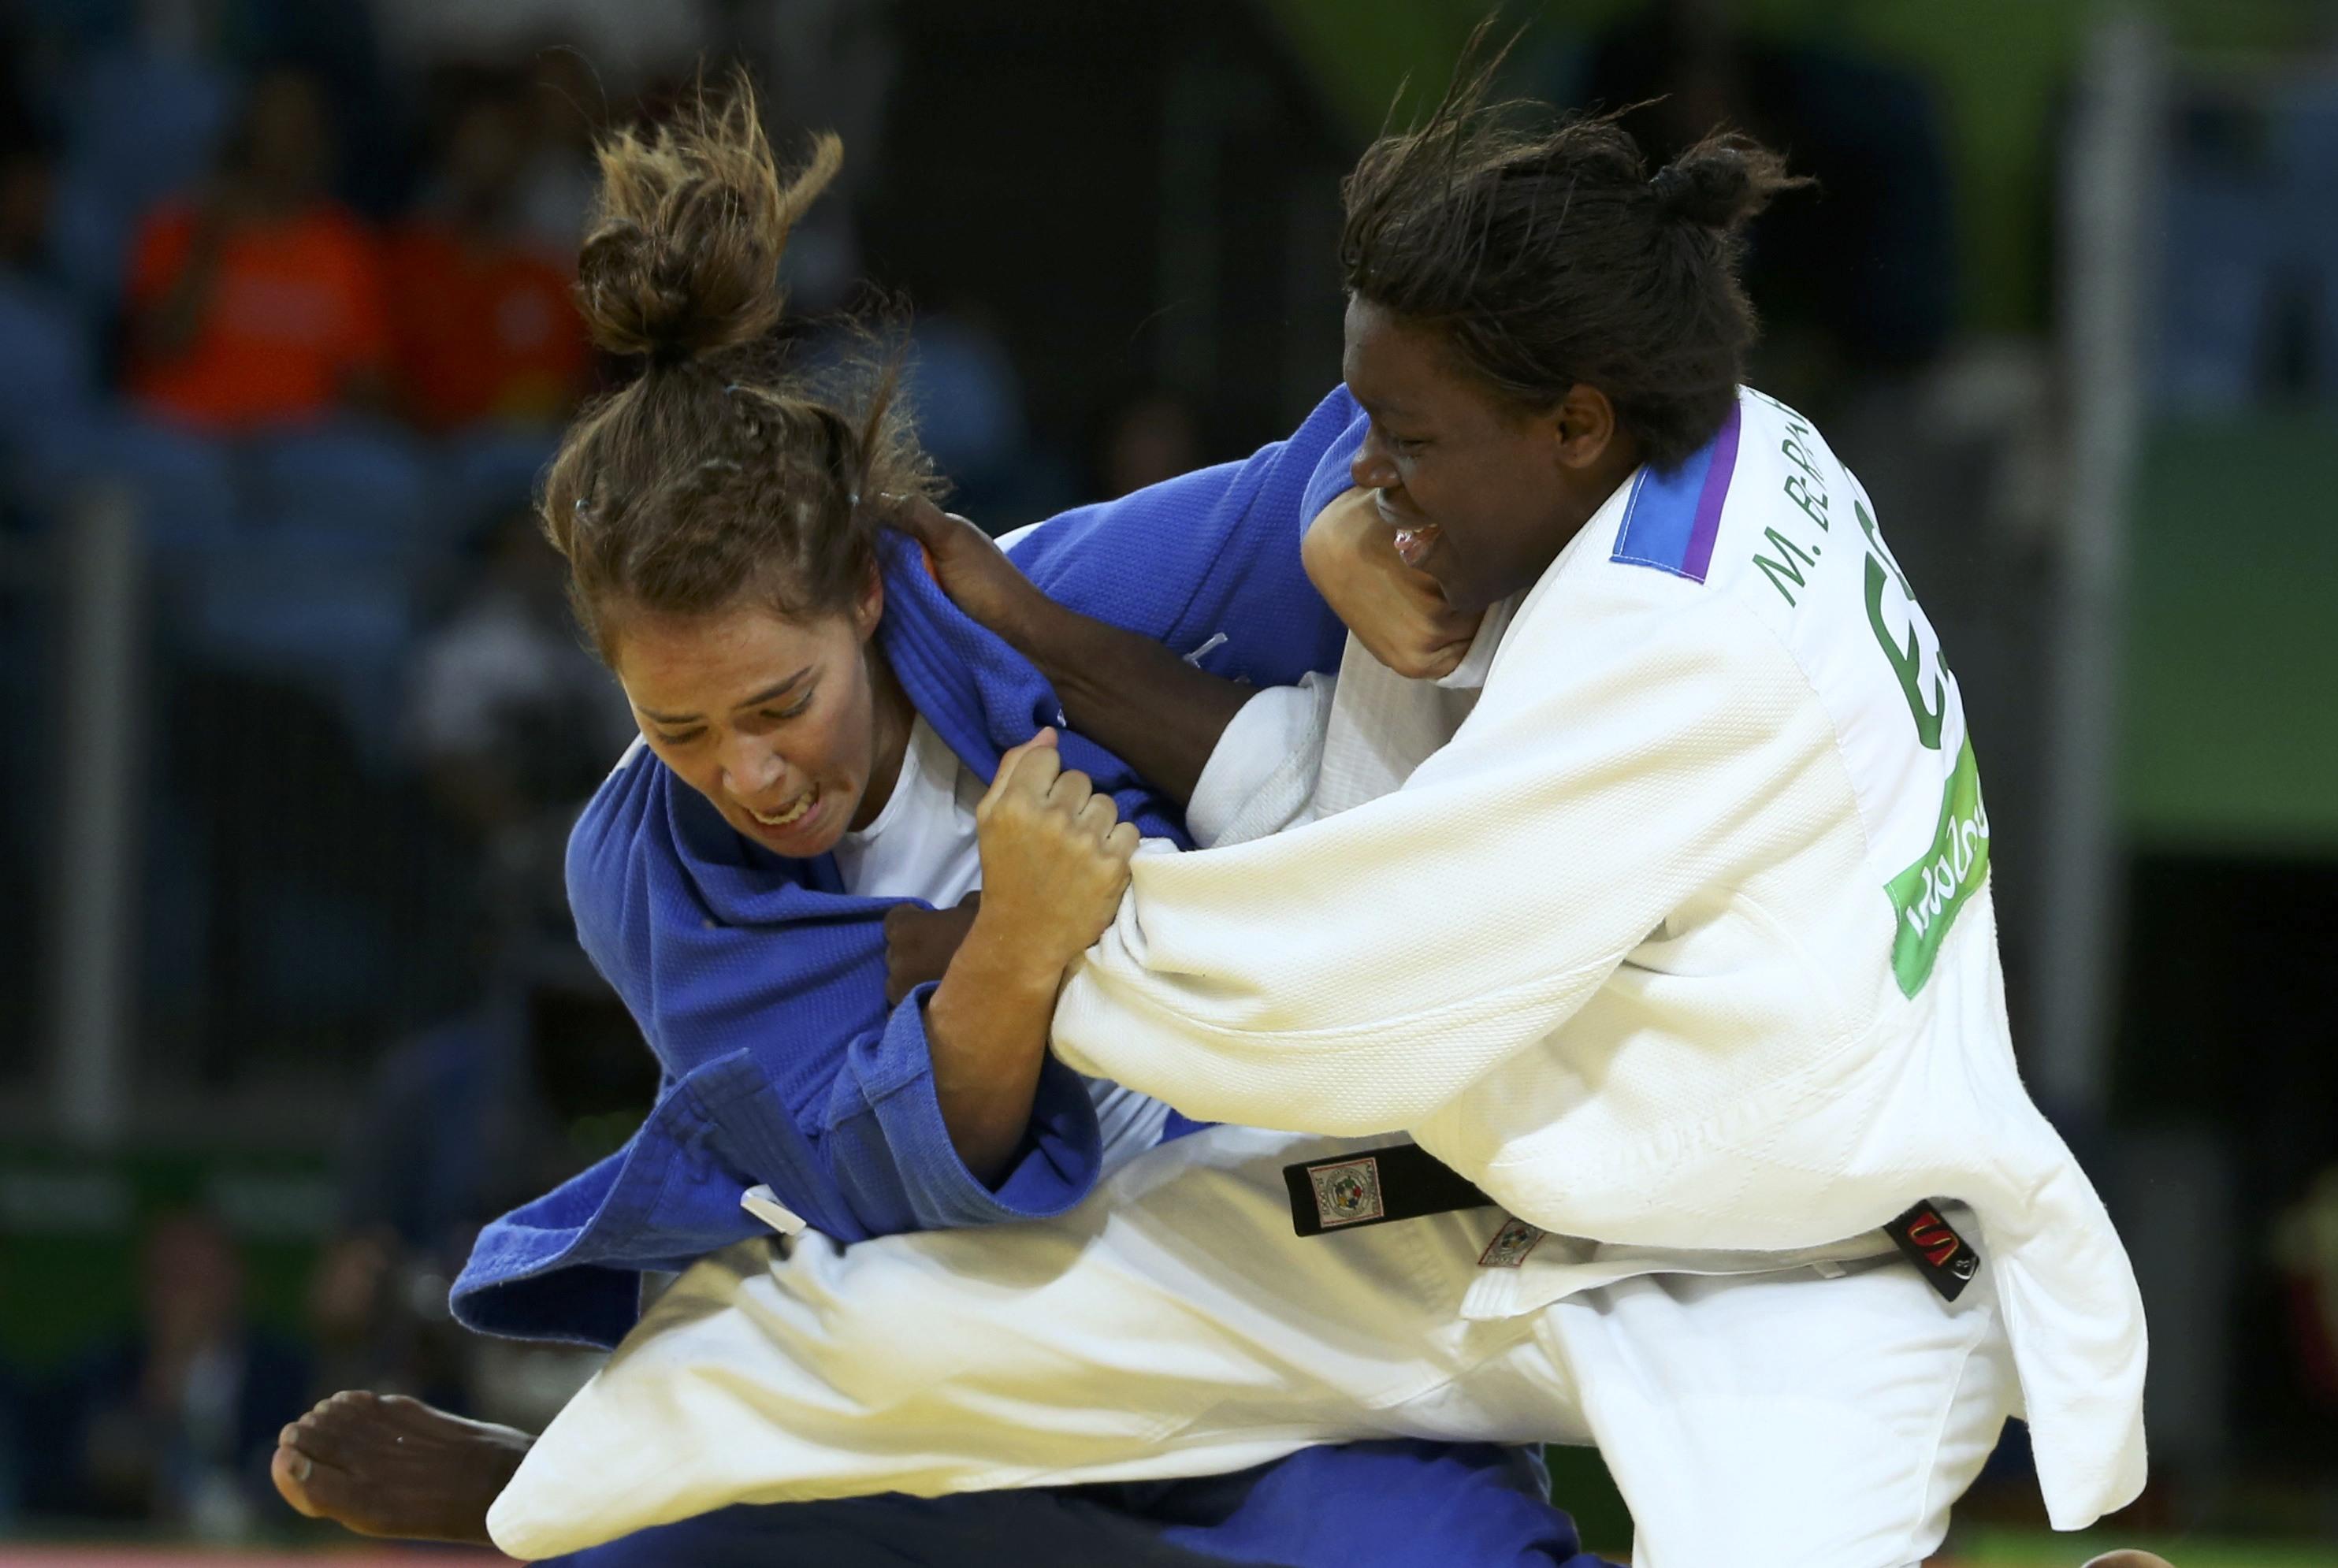 olympics-black-hand-israeli-athletes-nude-ebony-girl-pics